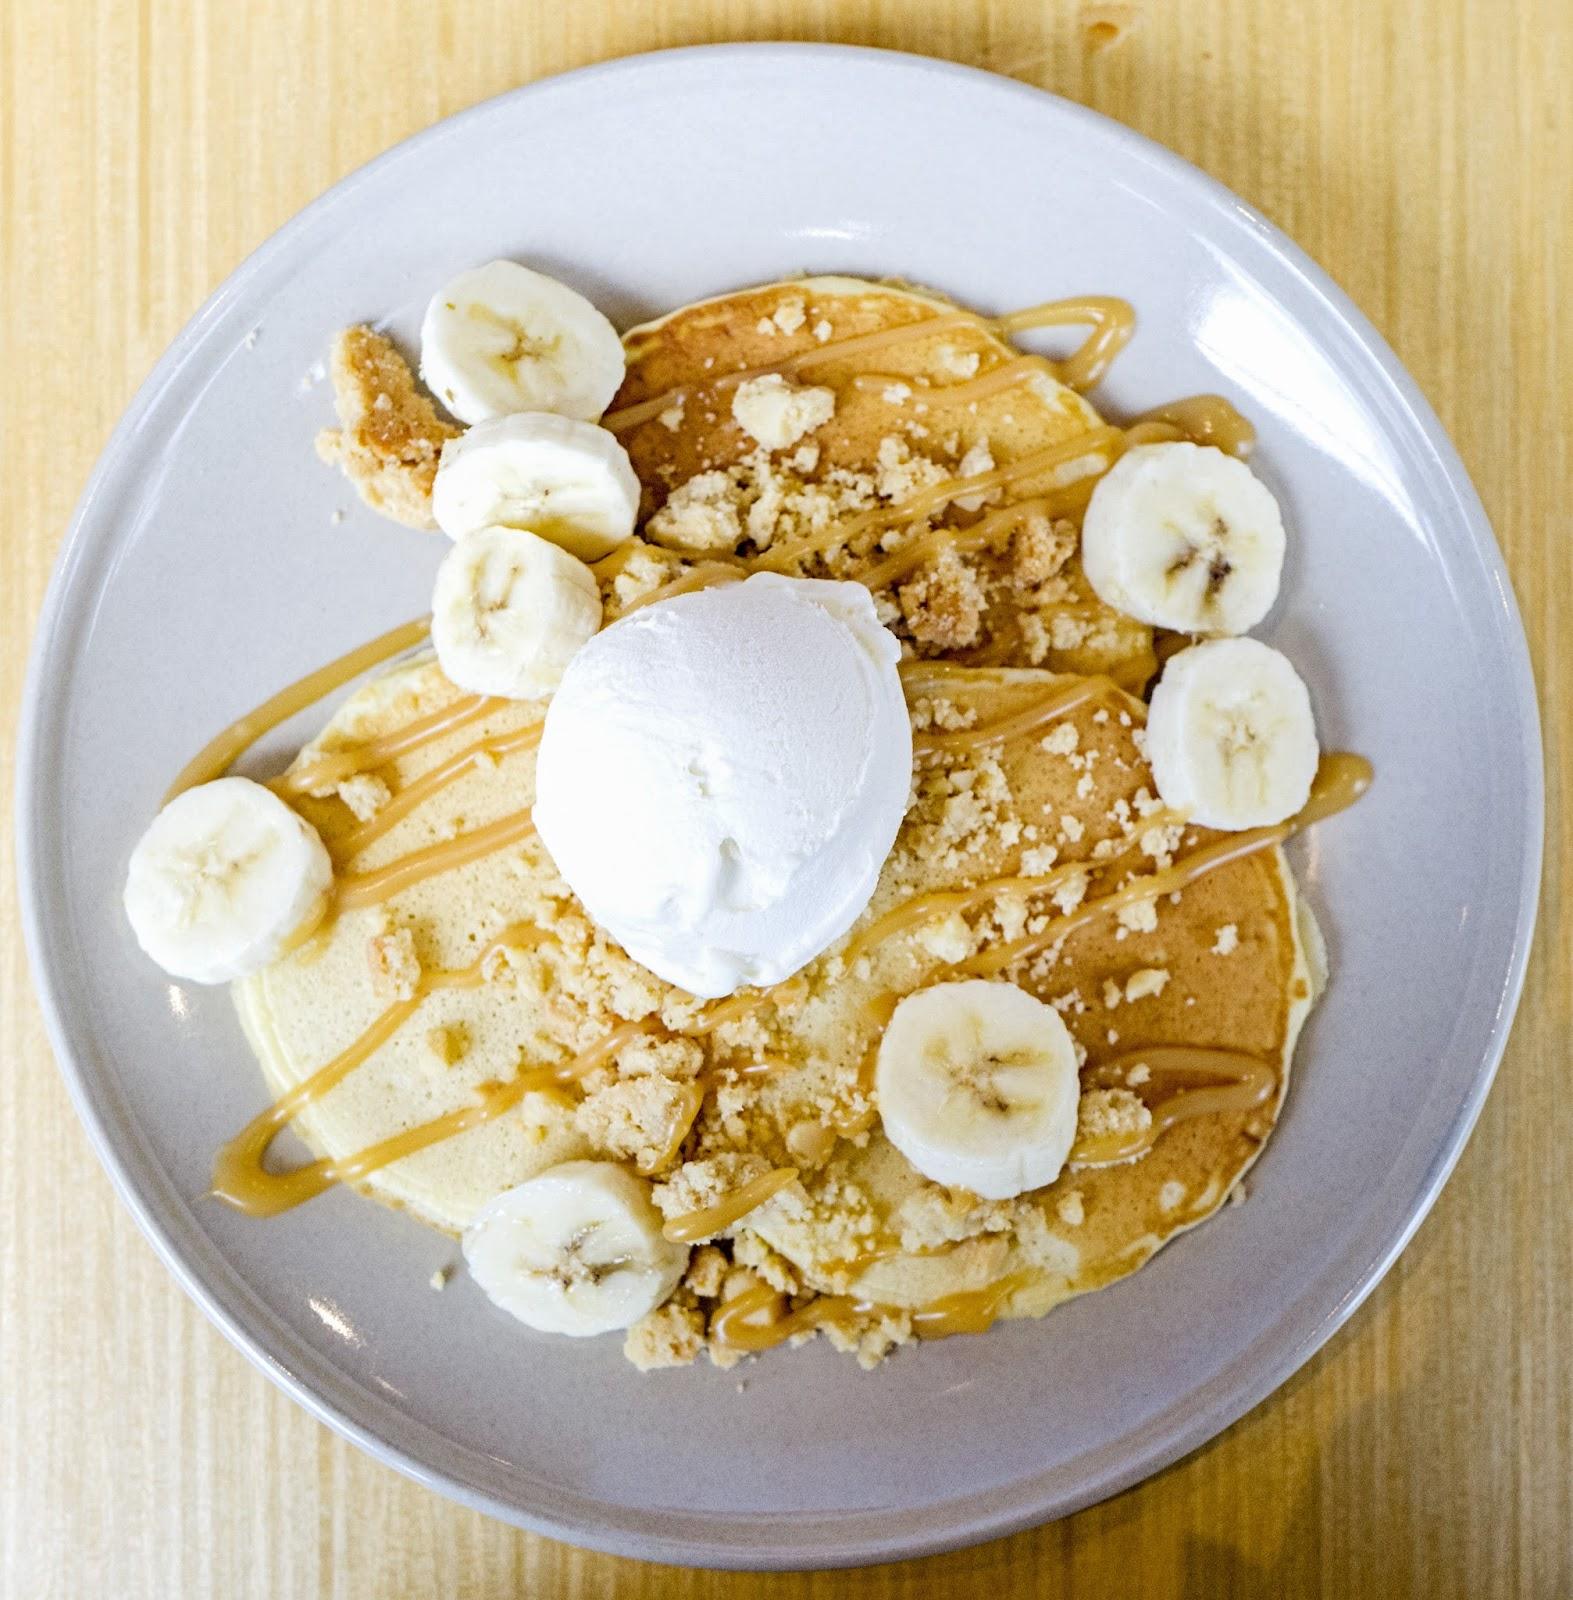 f-pancake-L1100374.jpg